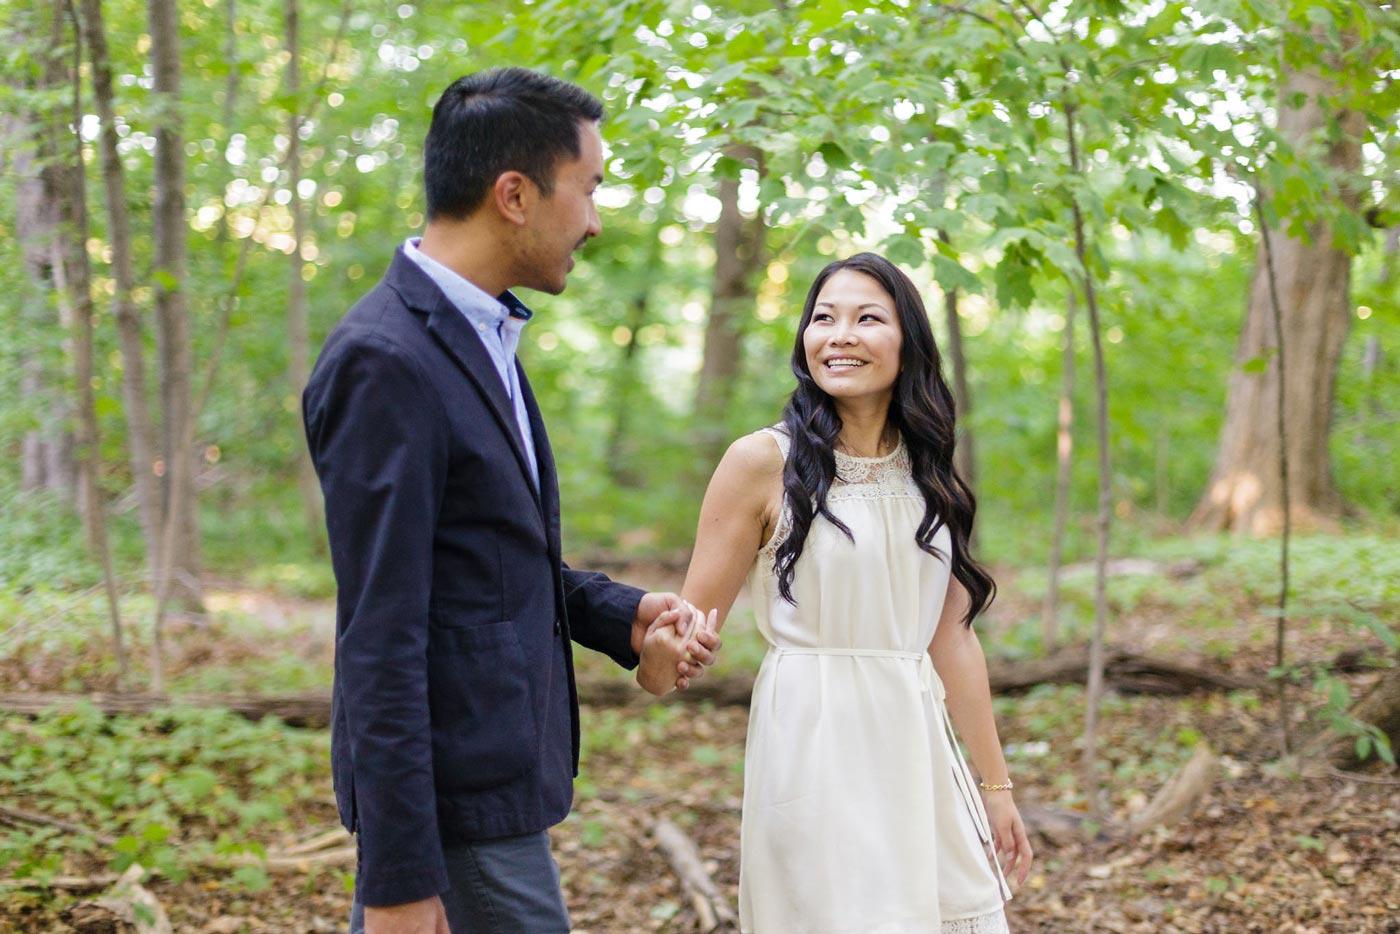 jessicahoang-jaca-engagement-milliken-park-3